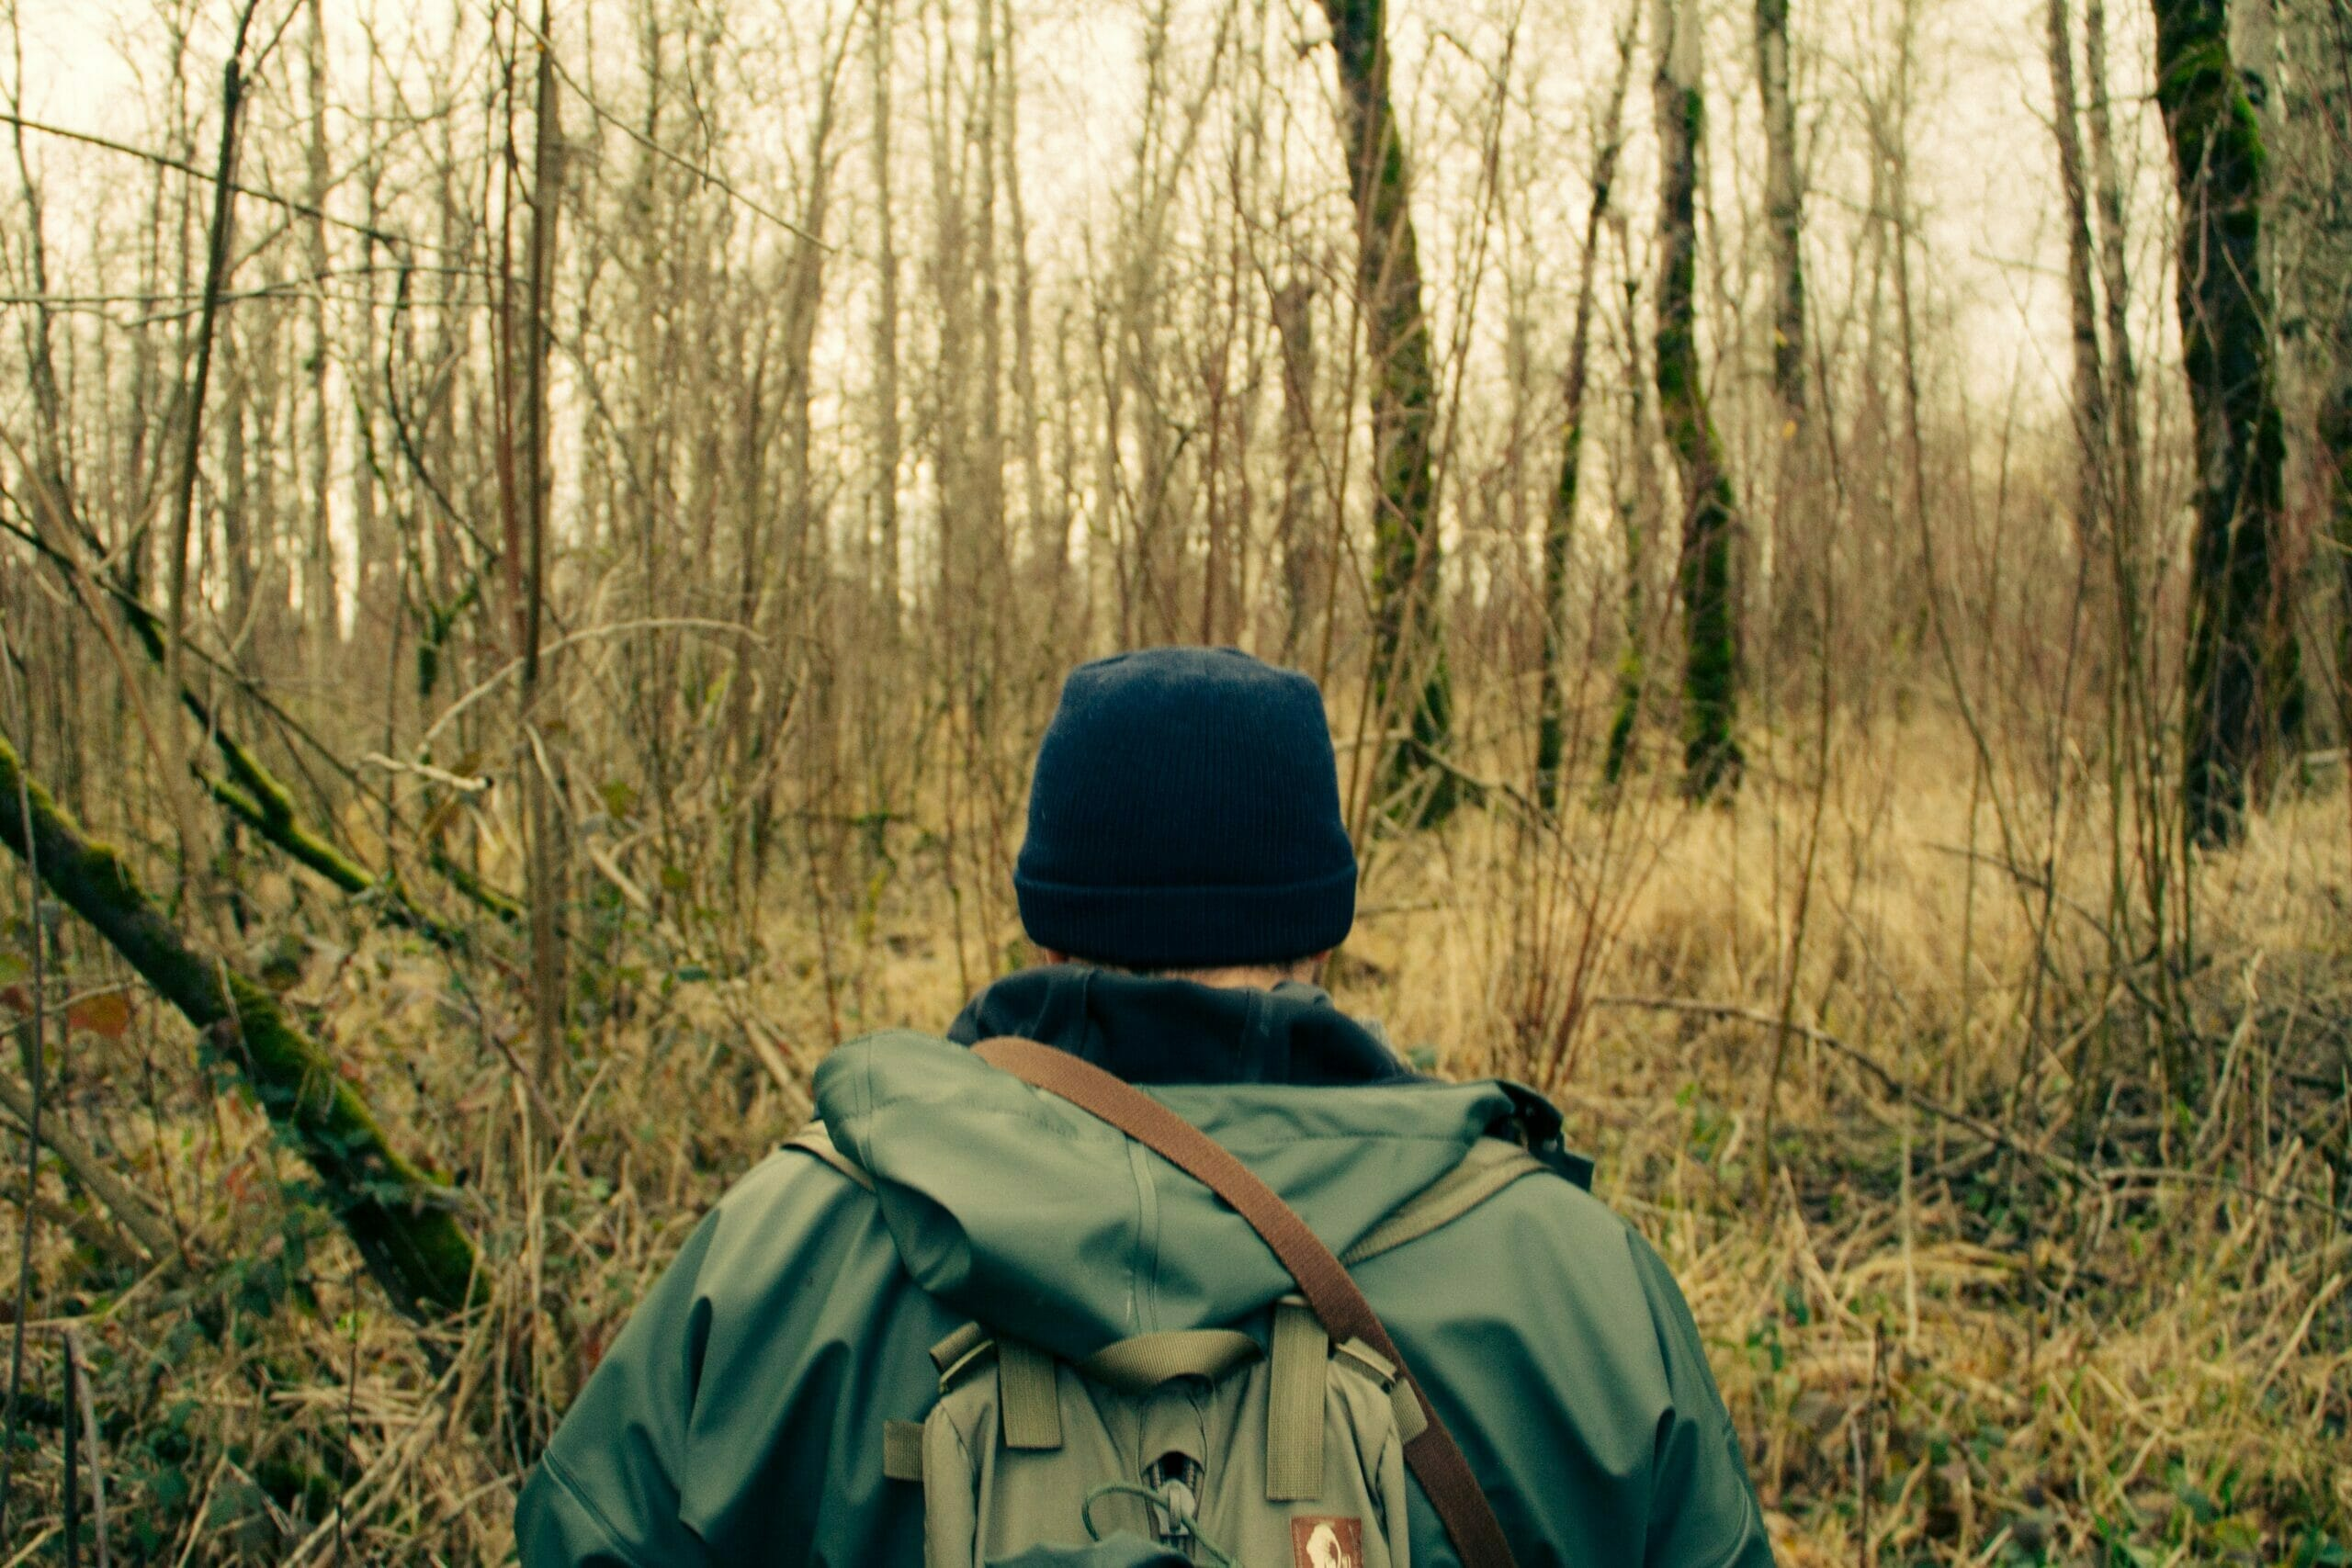 How to be an Introvert in an Extrovert World: 7 Inspiring Tips via @allamericanatlas